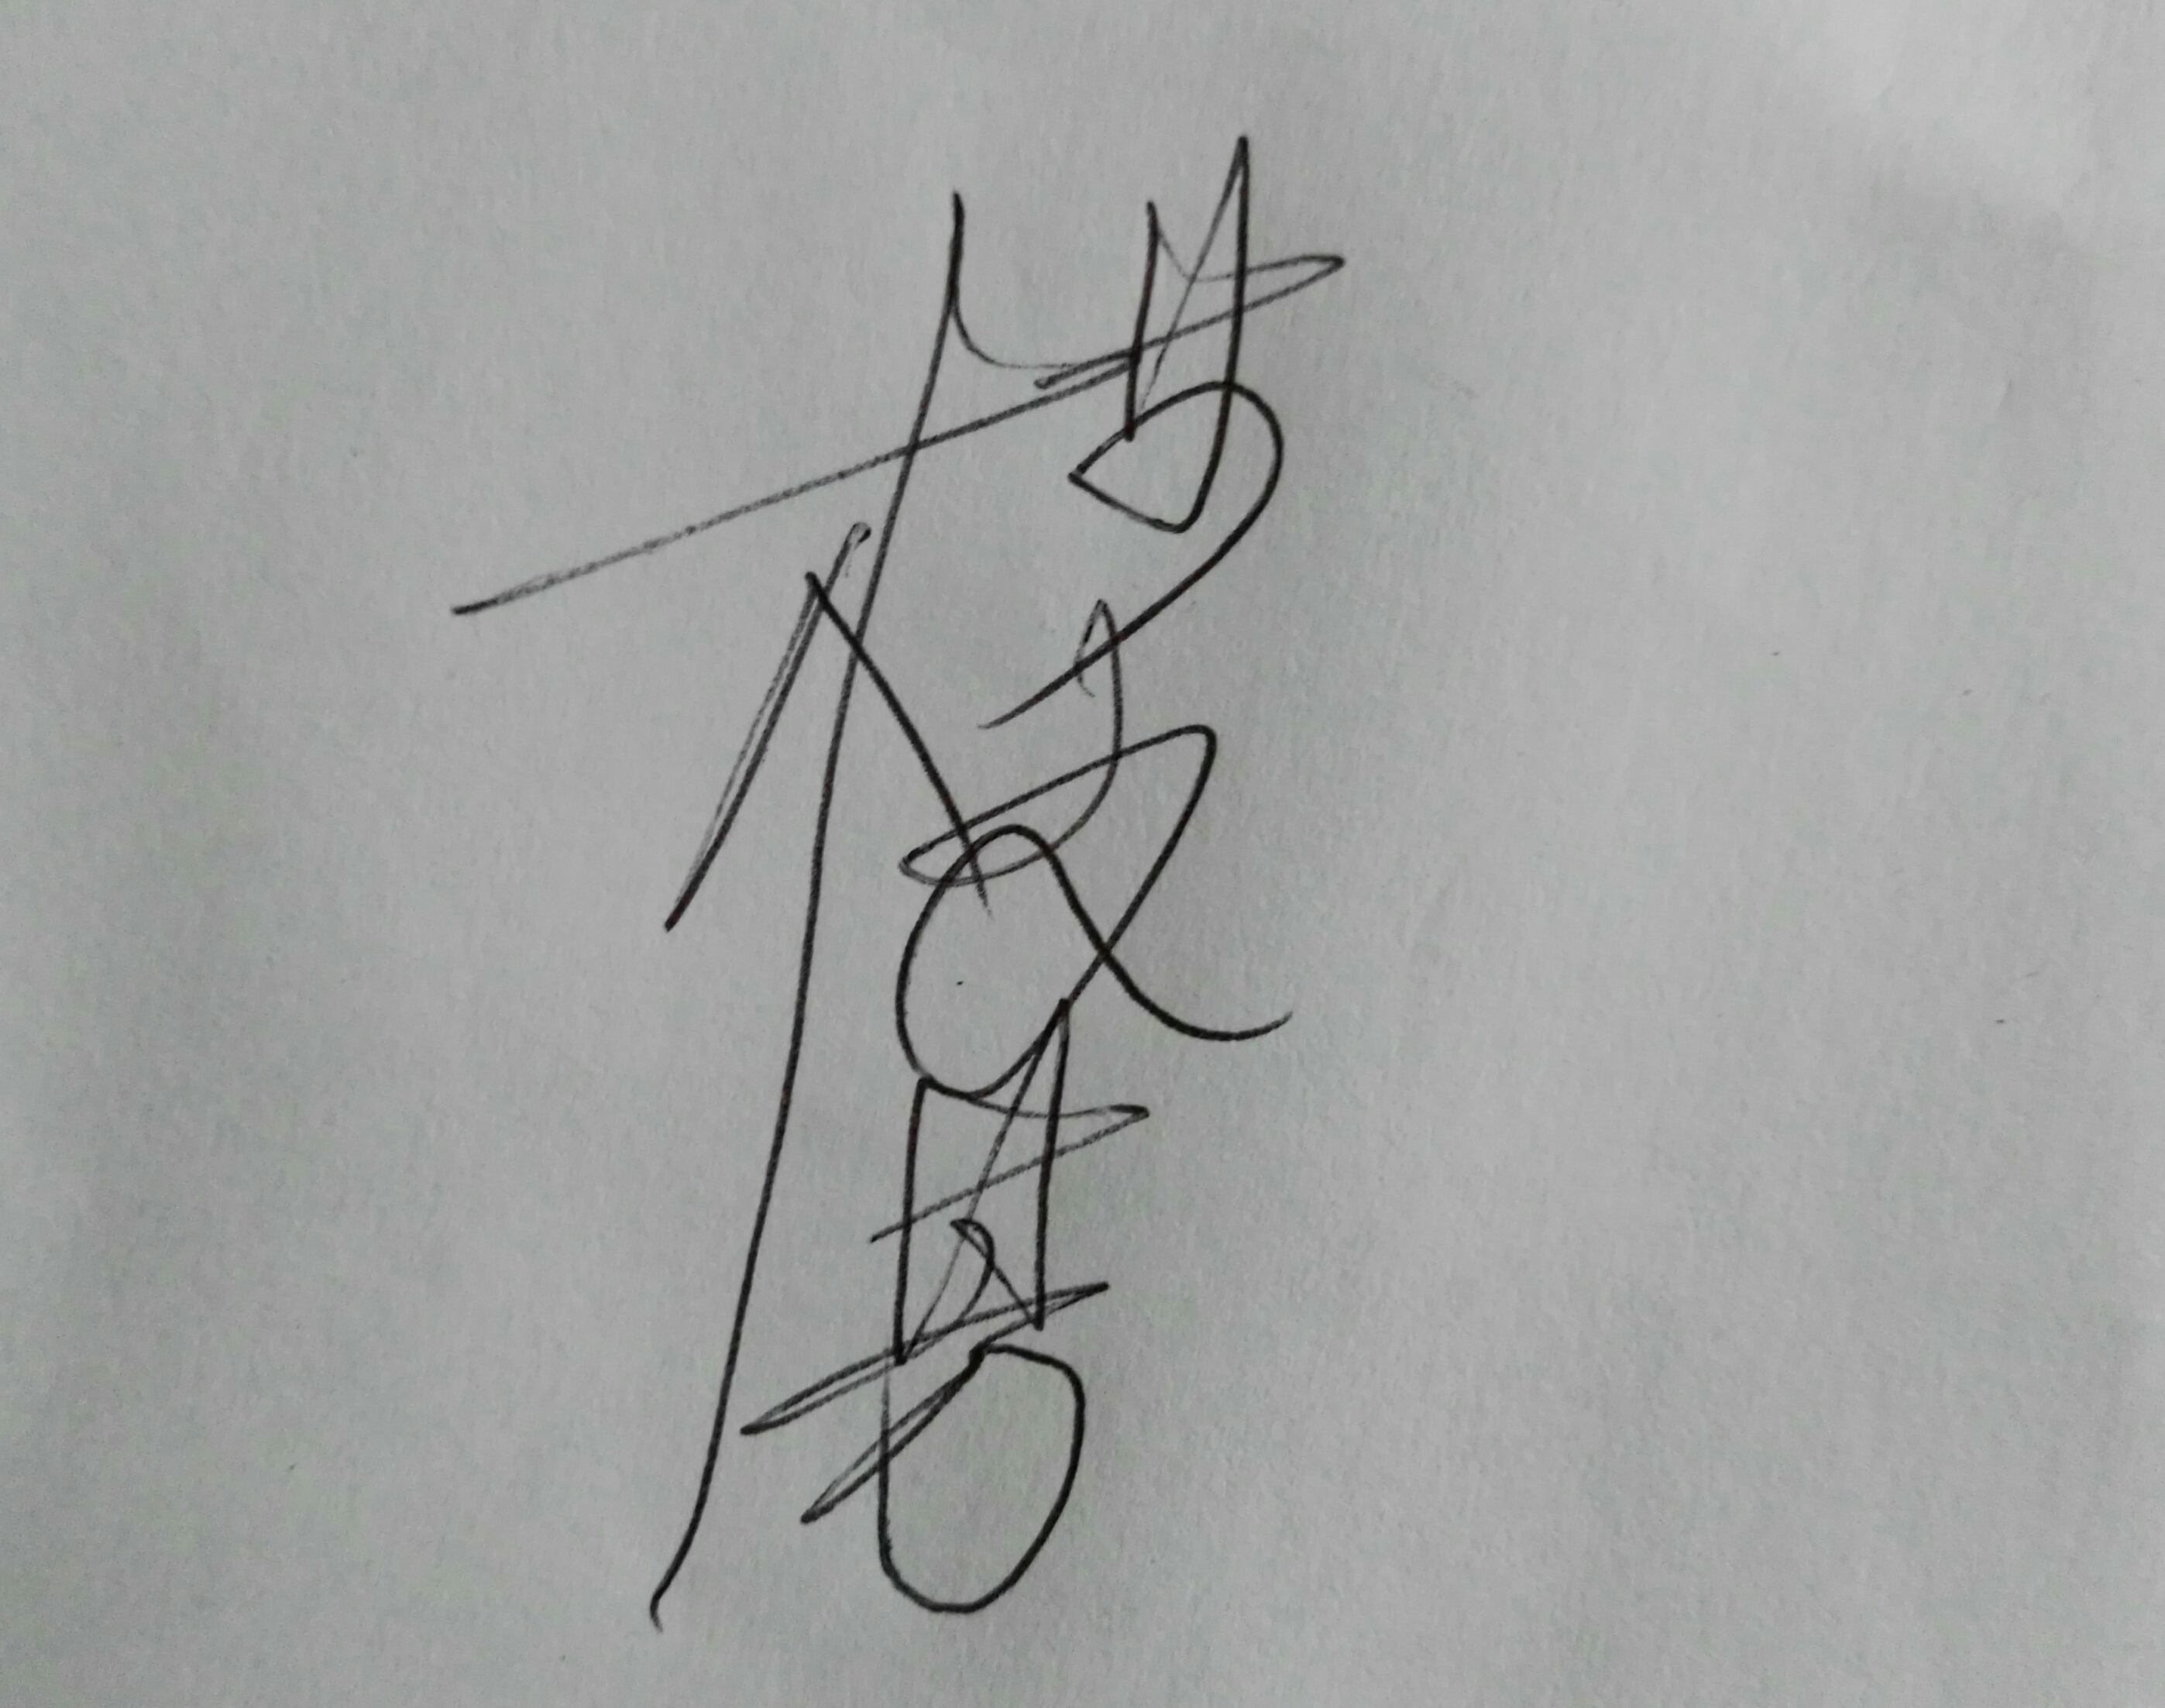 Joyce LimBH Signature